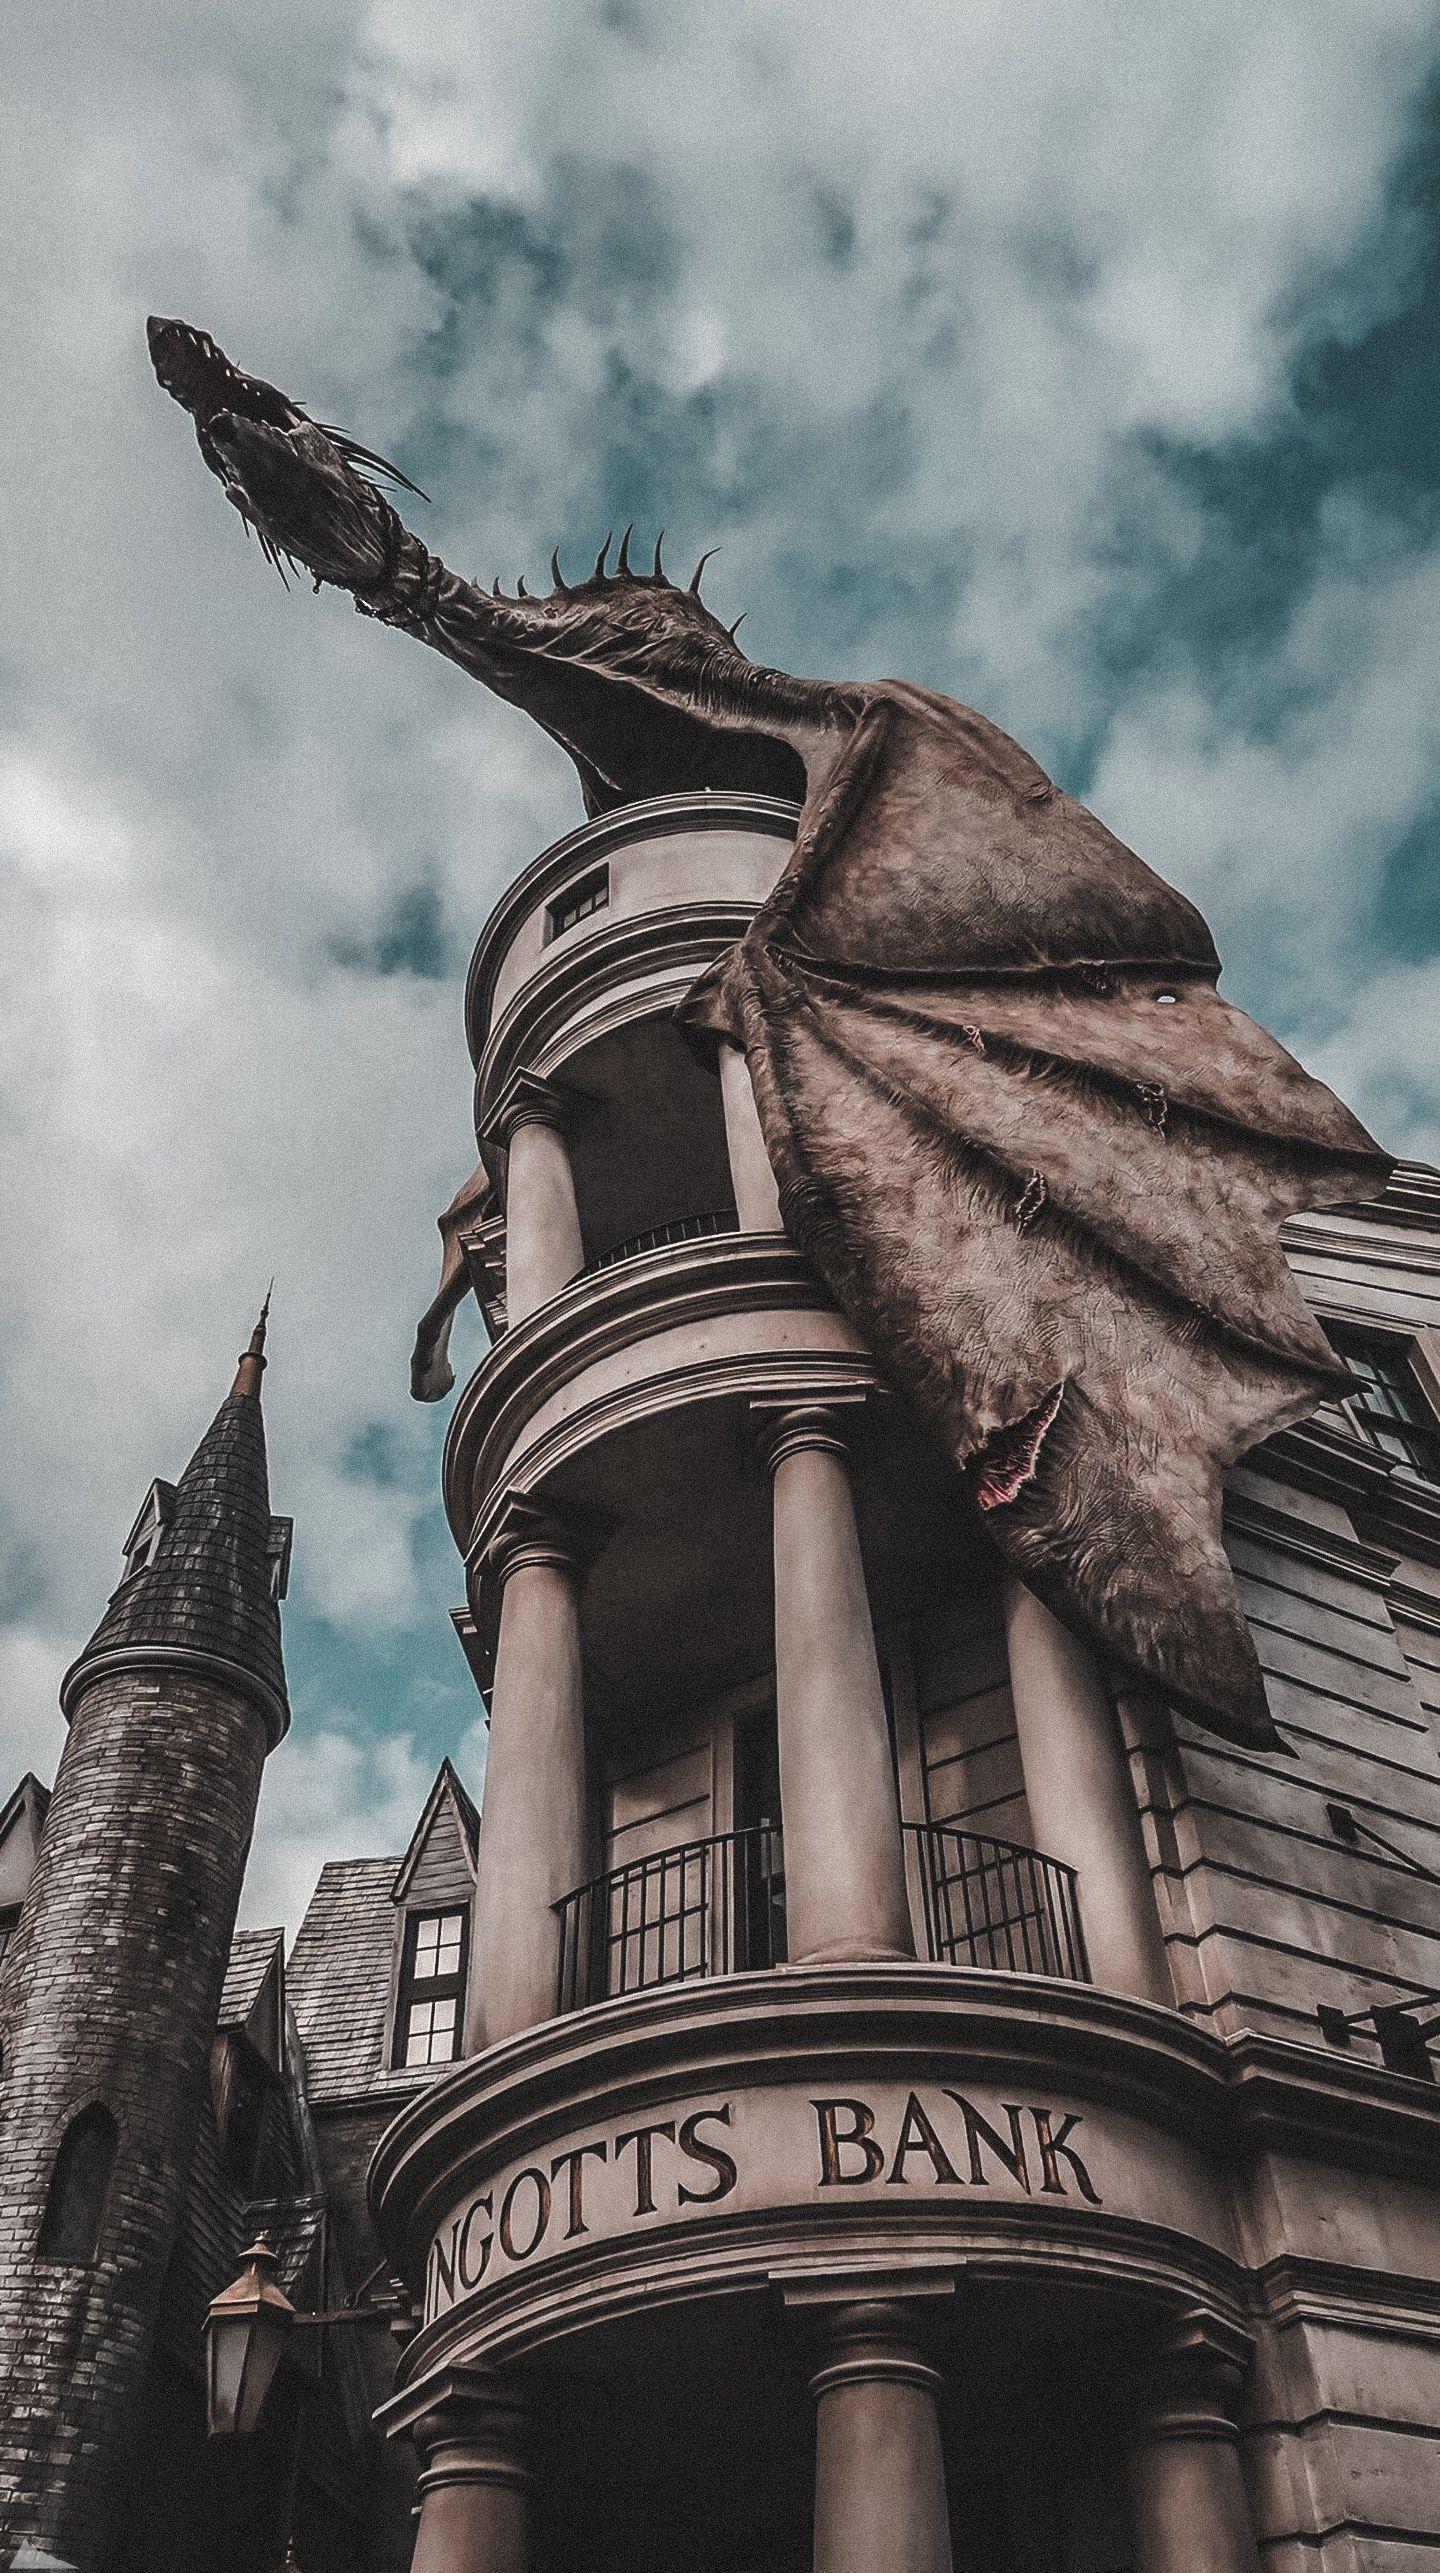 Oboi Na Telefon In 2020 Harry Potter Background Harry Potter Pictures Harry Potter Aesthetic